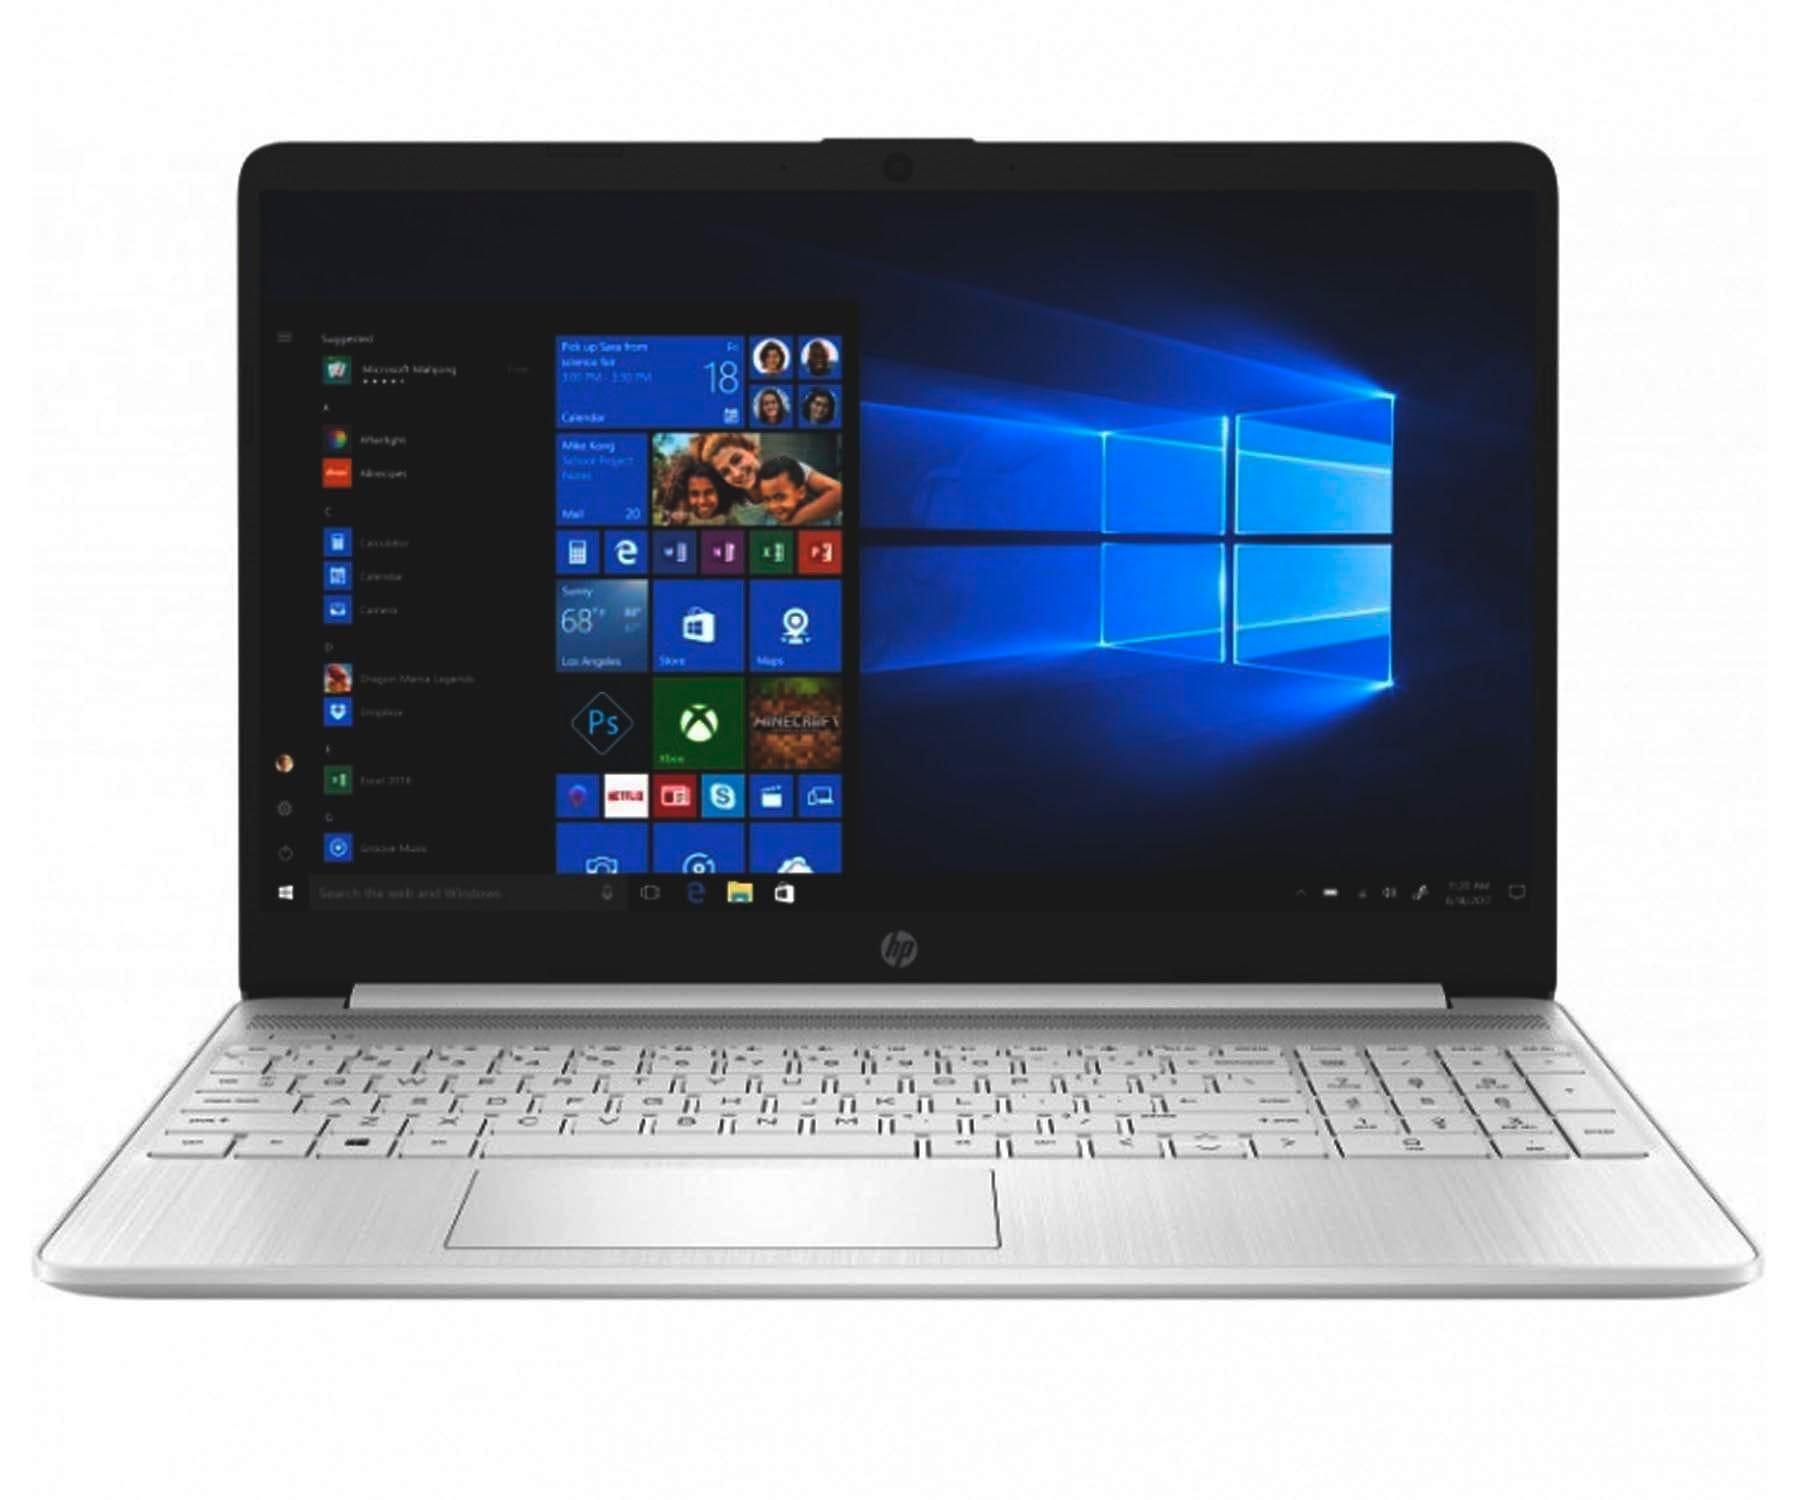 HP ENVY X360 15s-FQ1062 PLATA PORTÁTIL 15.6'' HD i5-1035G1 512GB SSD 16GB RAM WINDOWS 10 HOME